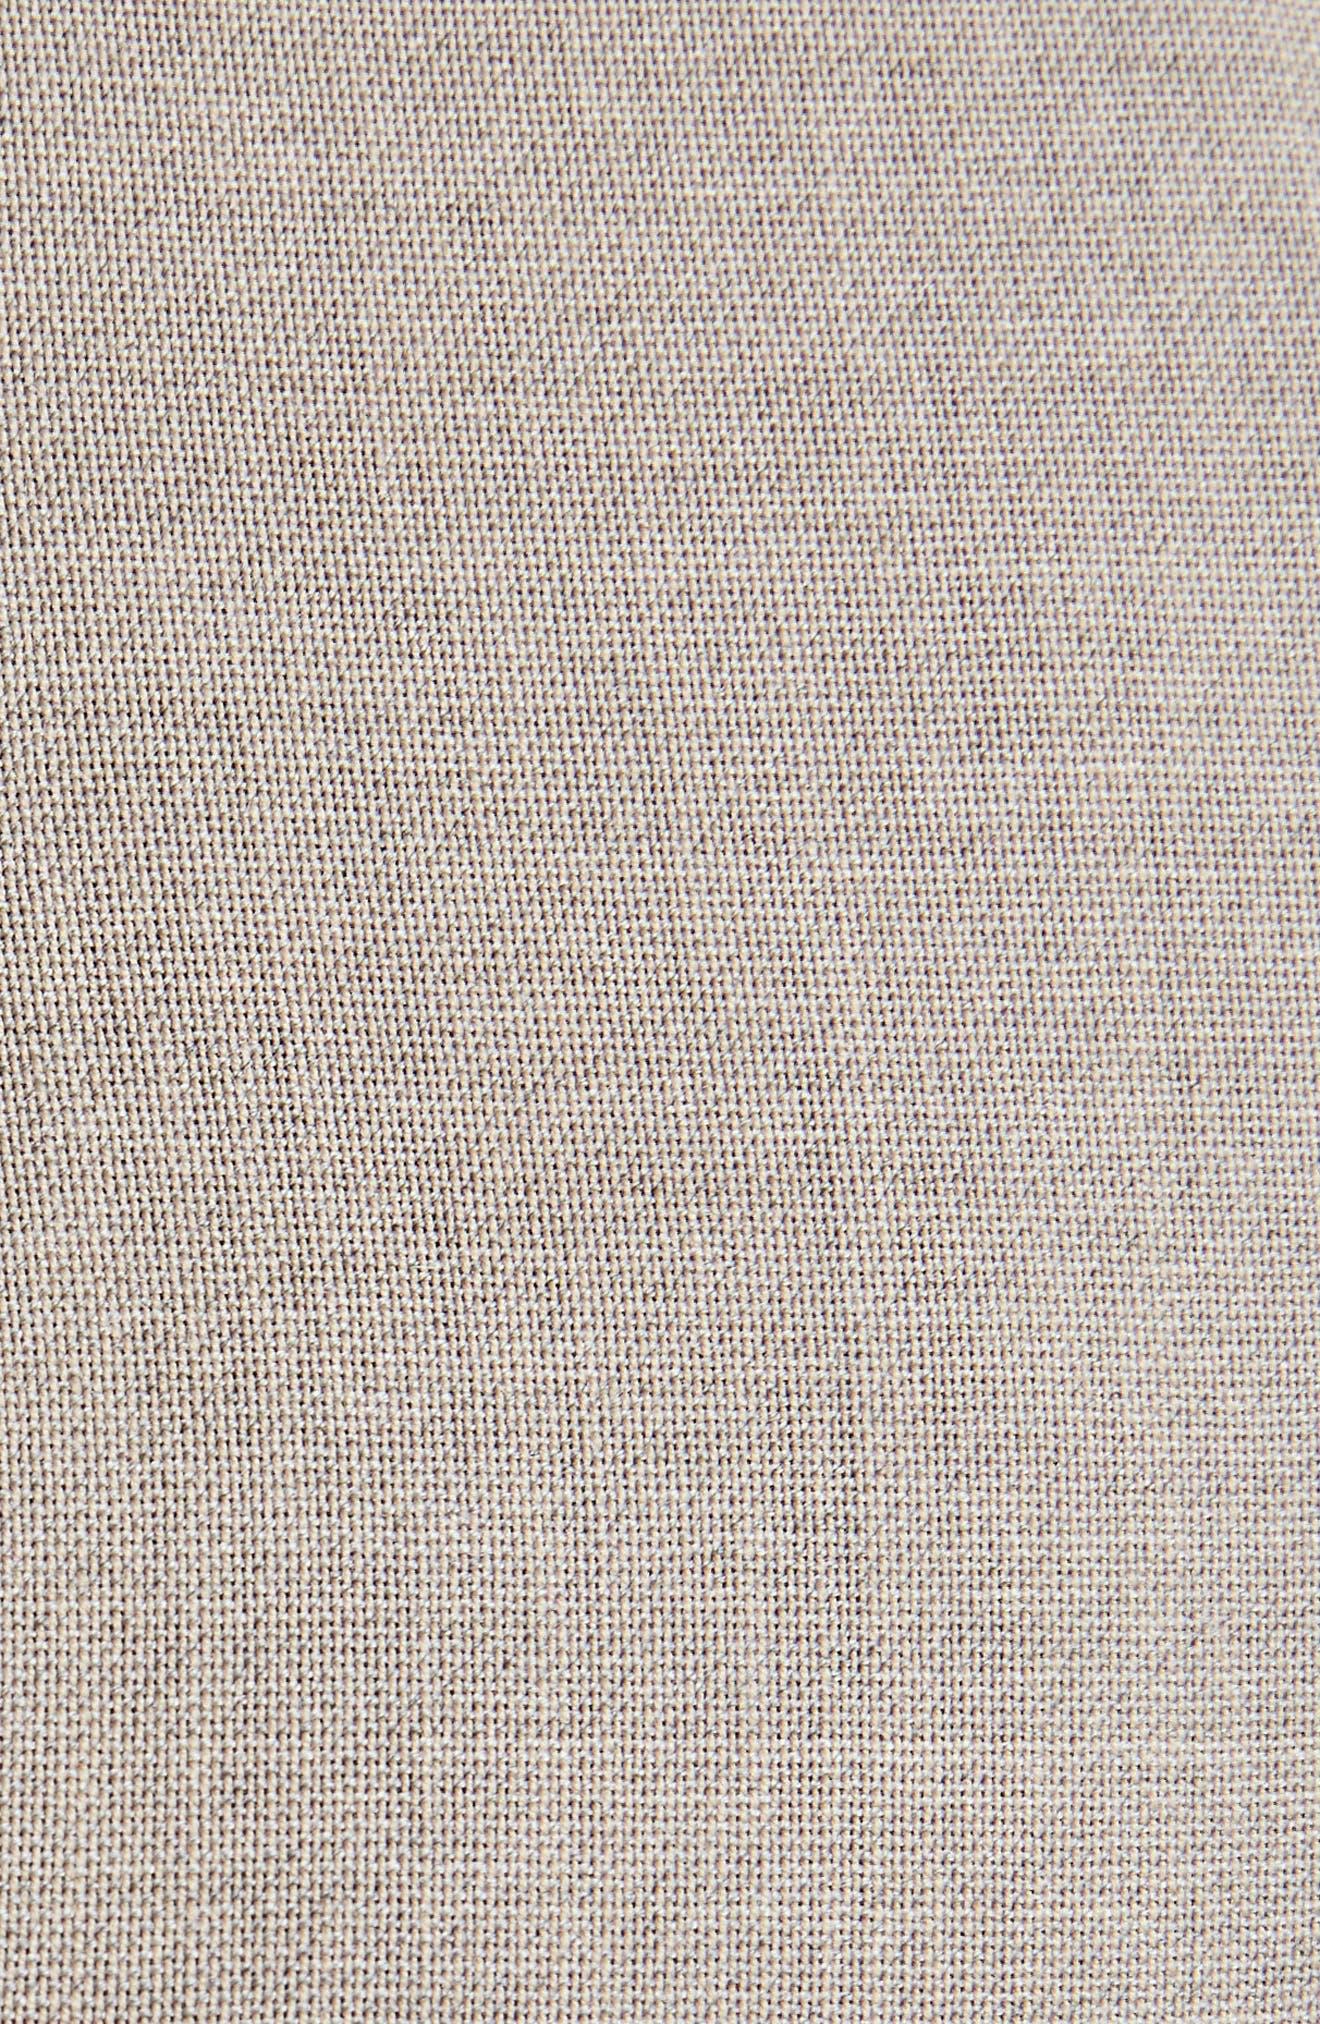 Toni Fluid Wide Leg Wool Pants,                             Alternate thumbnail 5, color,                             250